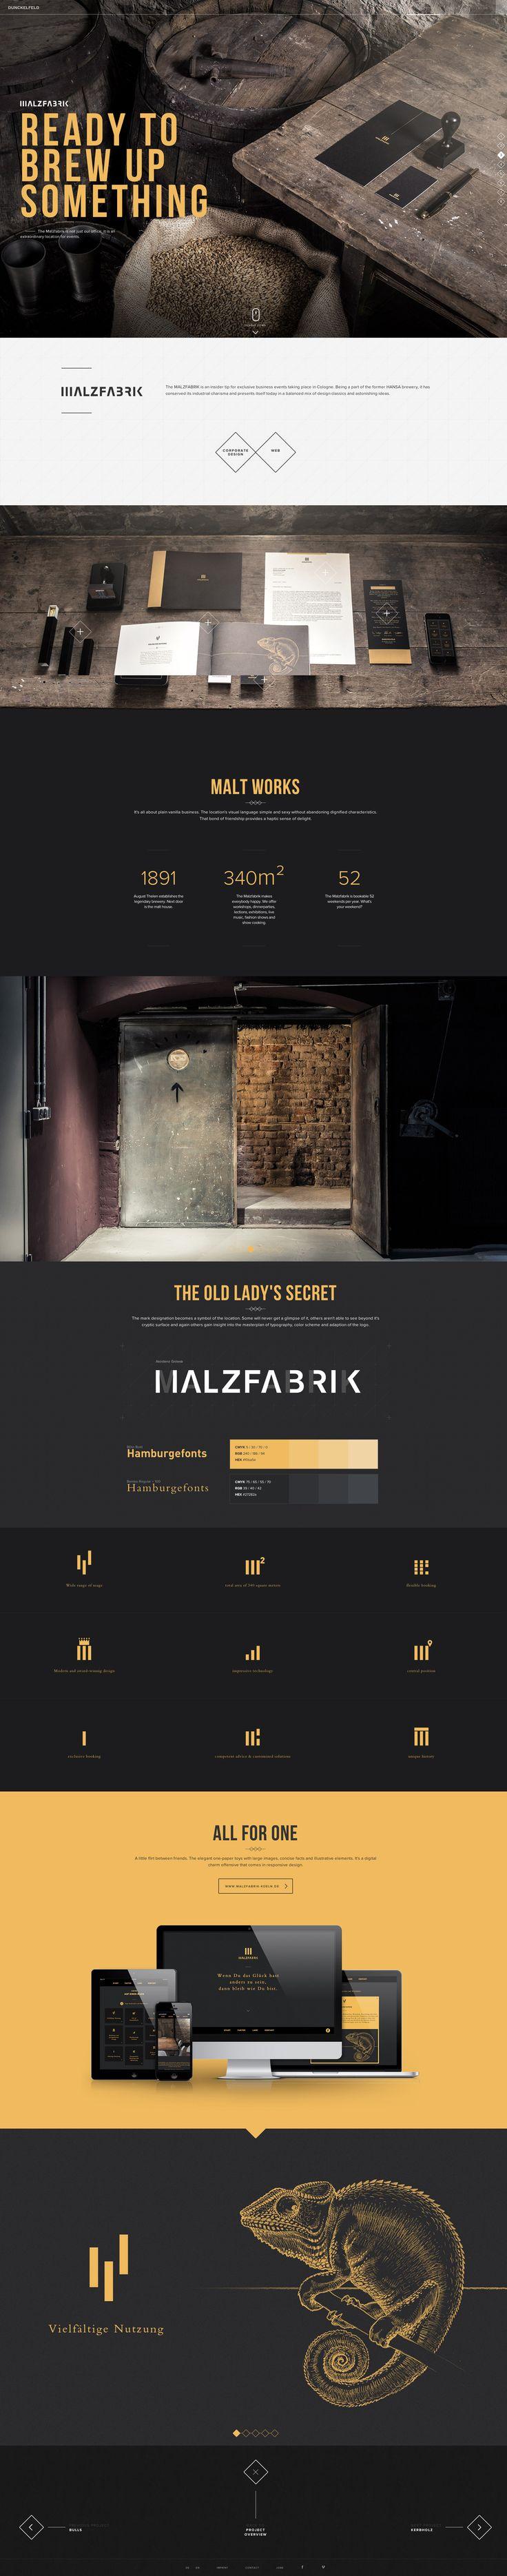 Dunckelfeld.de | #webdesign #it #web #design #layout #userinterface #website #webdesign repinned by www.BlickeDeeler.de | Visit our website www.blickedeeler.de/leistungen/webdesign